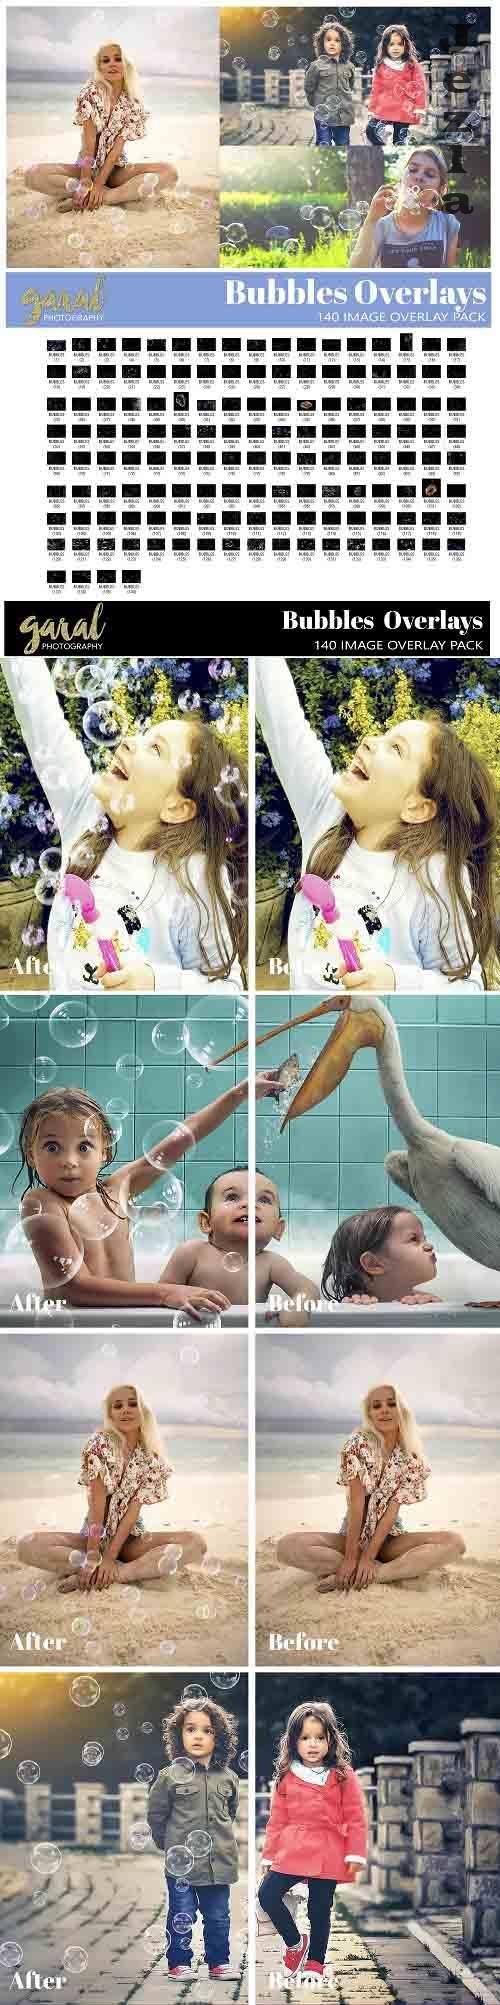 140 Bubbles Digital Overlays - 630187 - Soap Bubbles